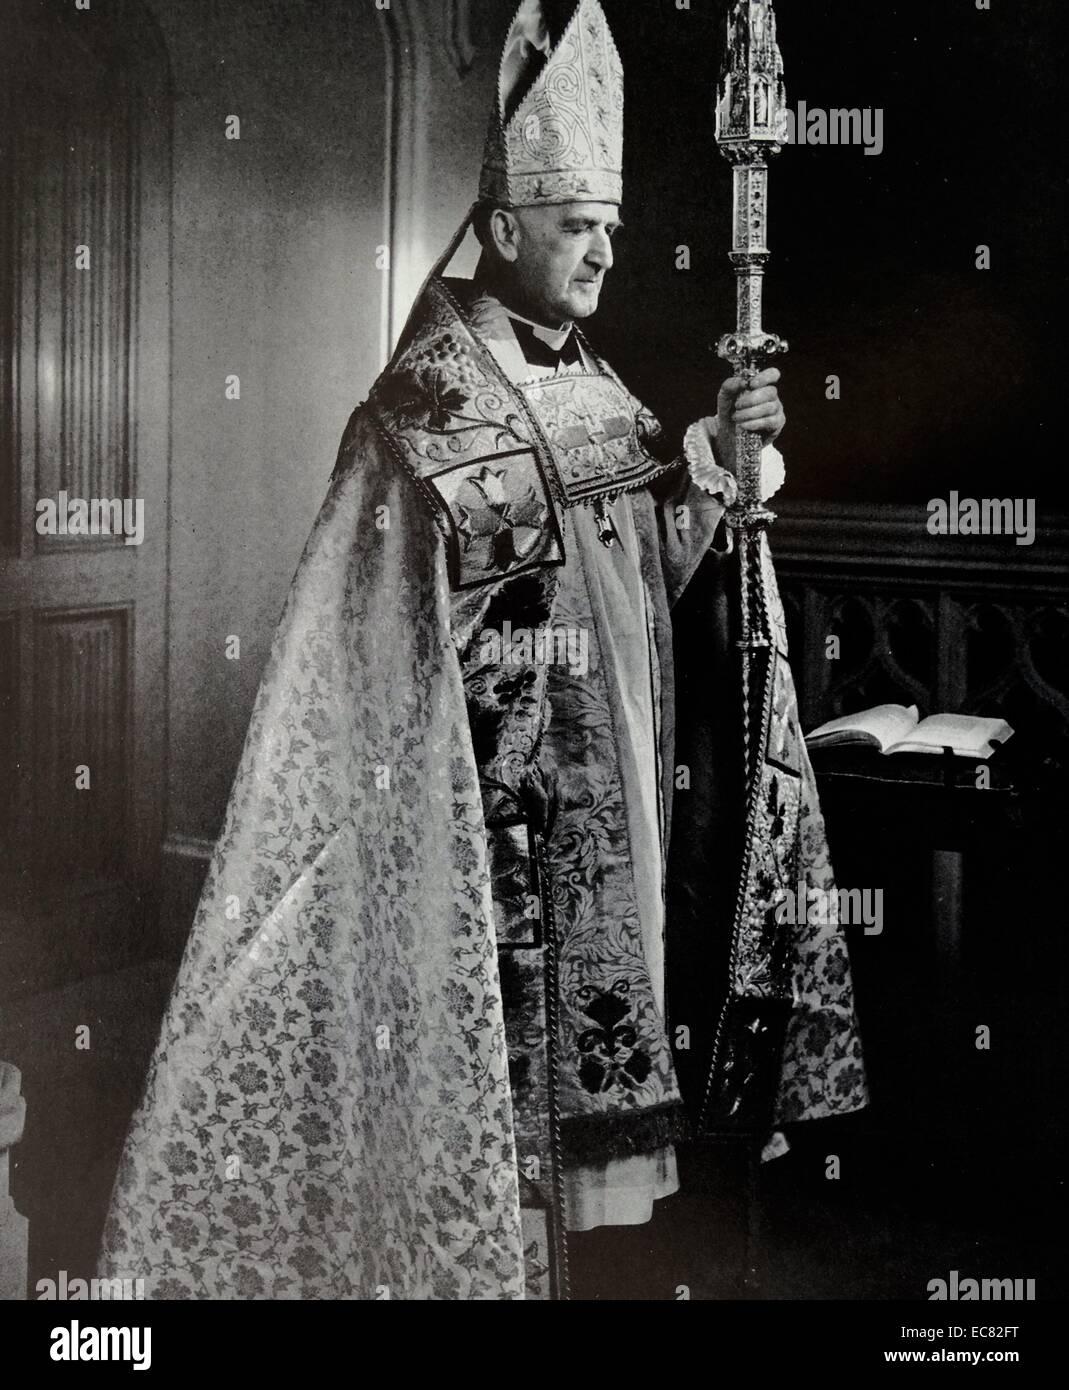 Photograph of Archbishop of Canterbury, Geoffrey Fisher (1887-1972) Archbishop of Canterbury from 1945 to 1961. - Stock Image